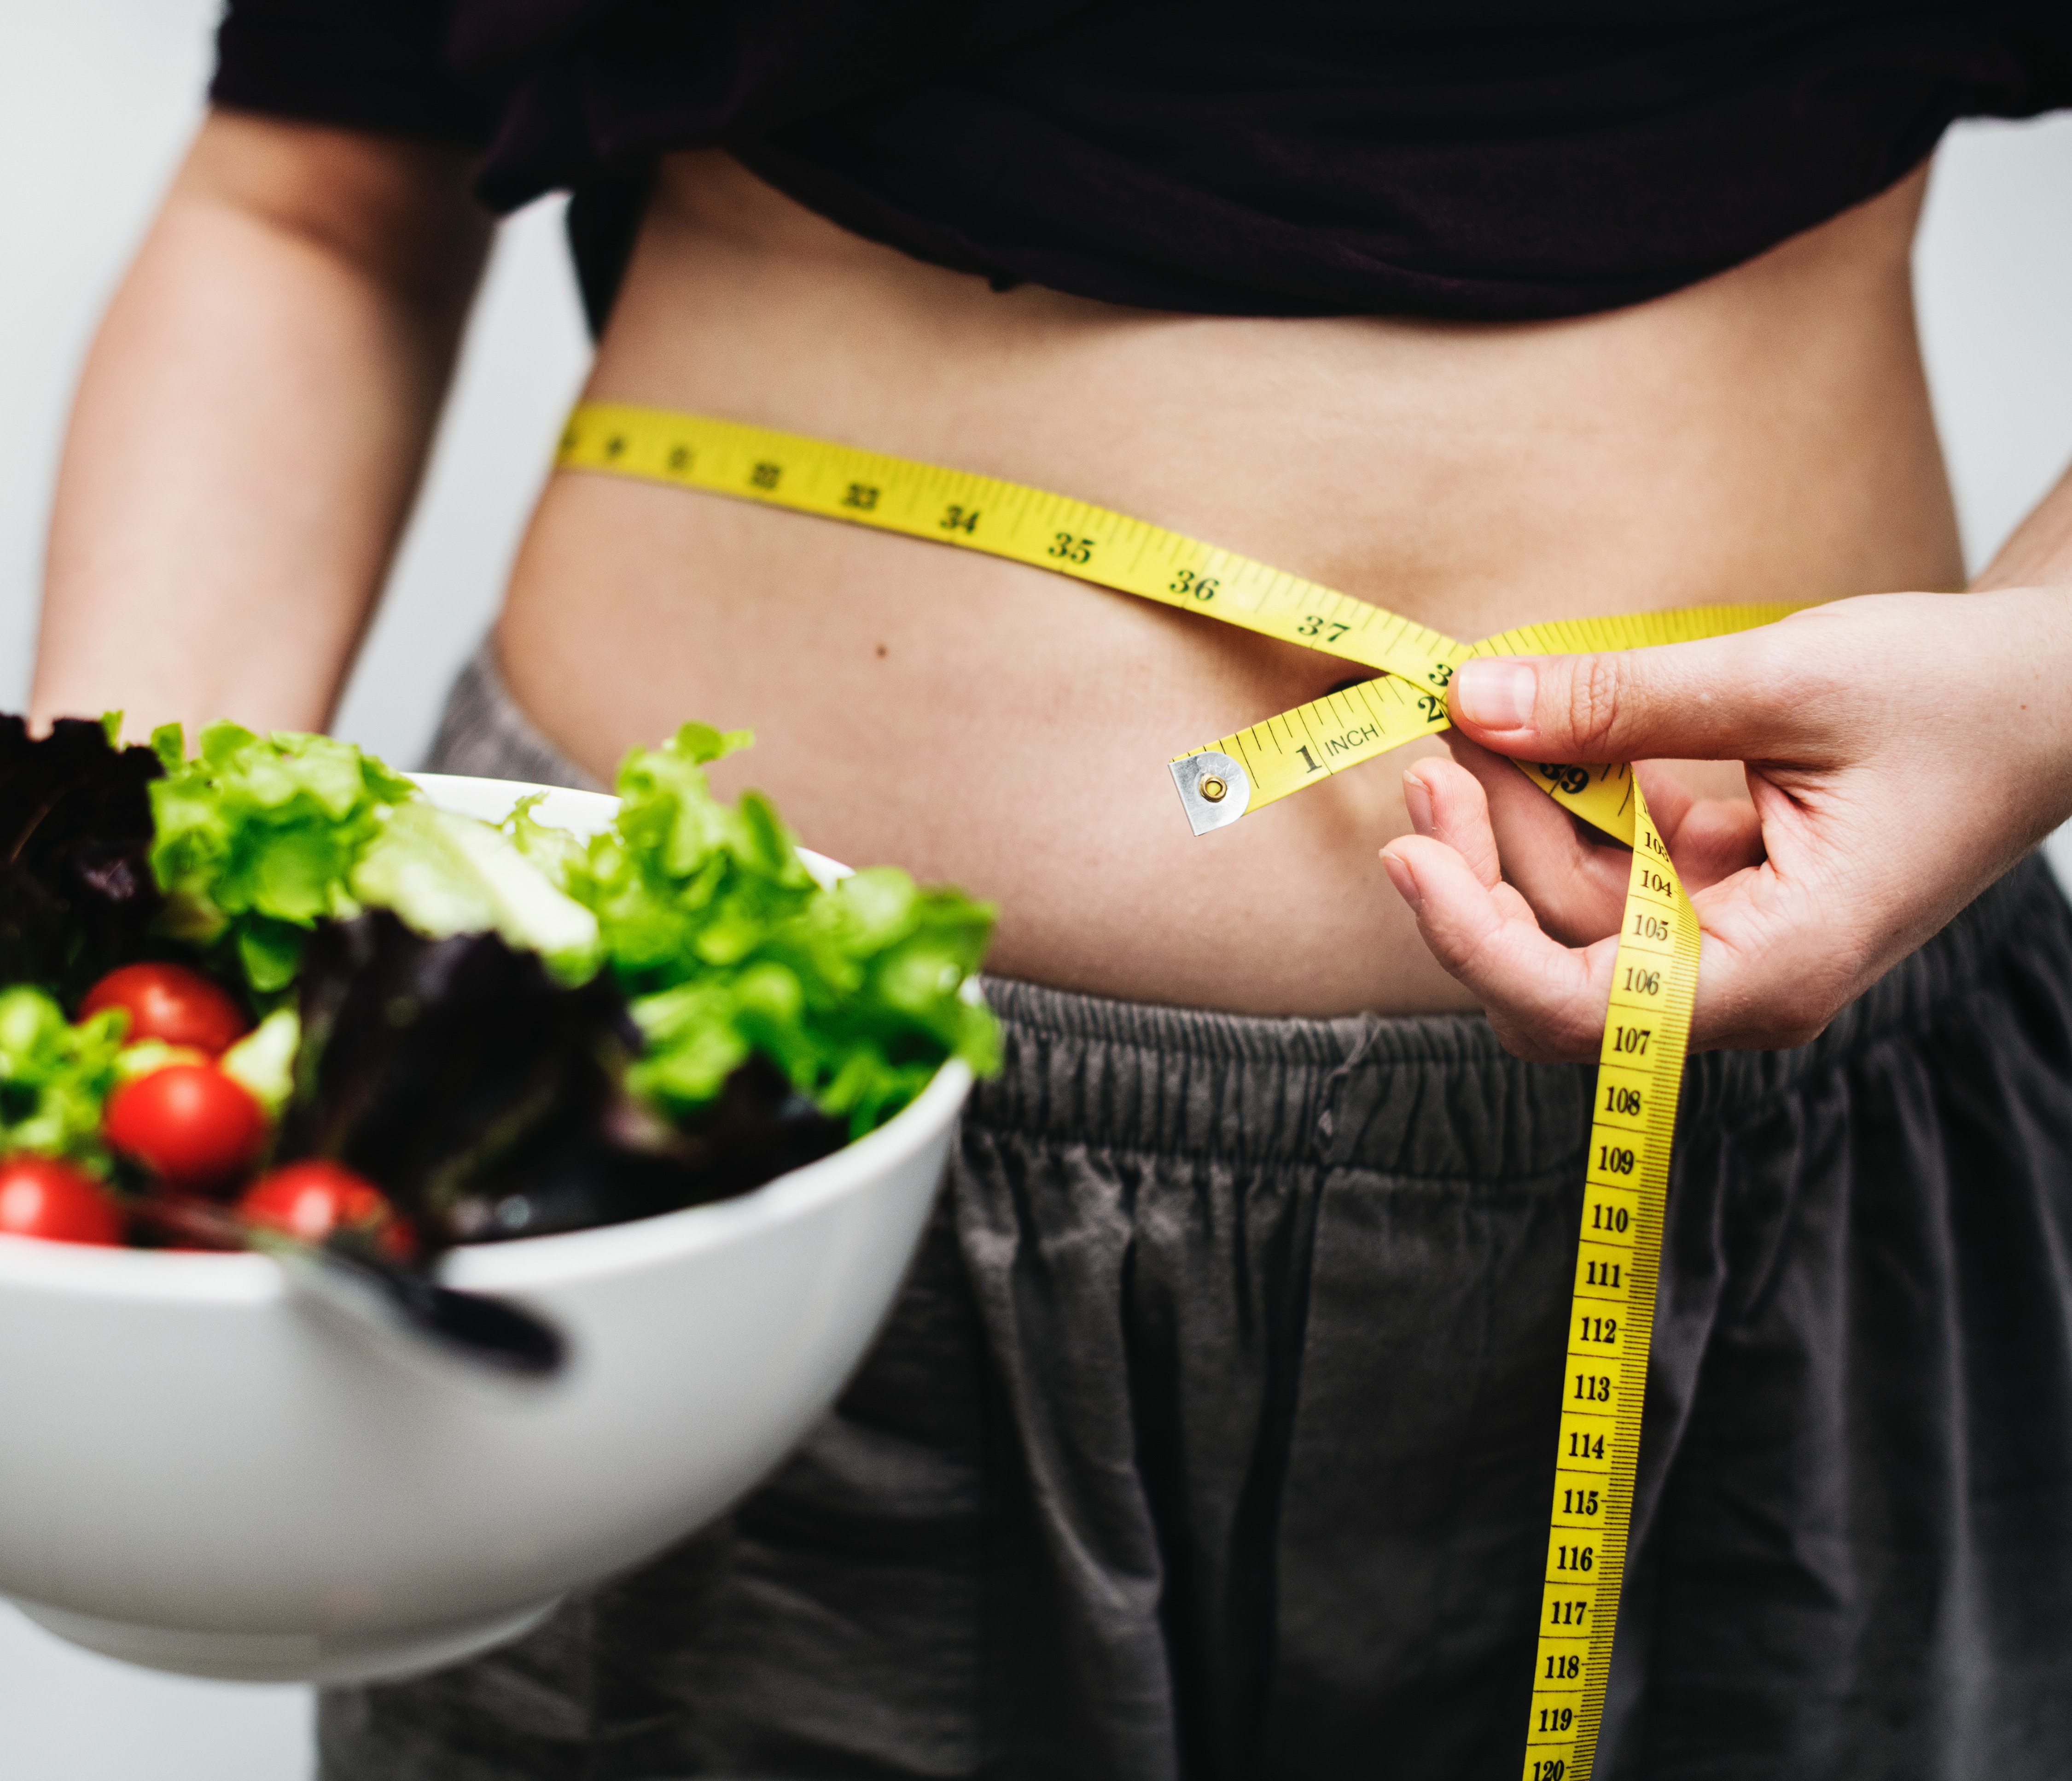 Síndrome metabólica: entenda o que é e quais as formas de se cuidar